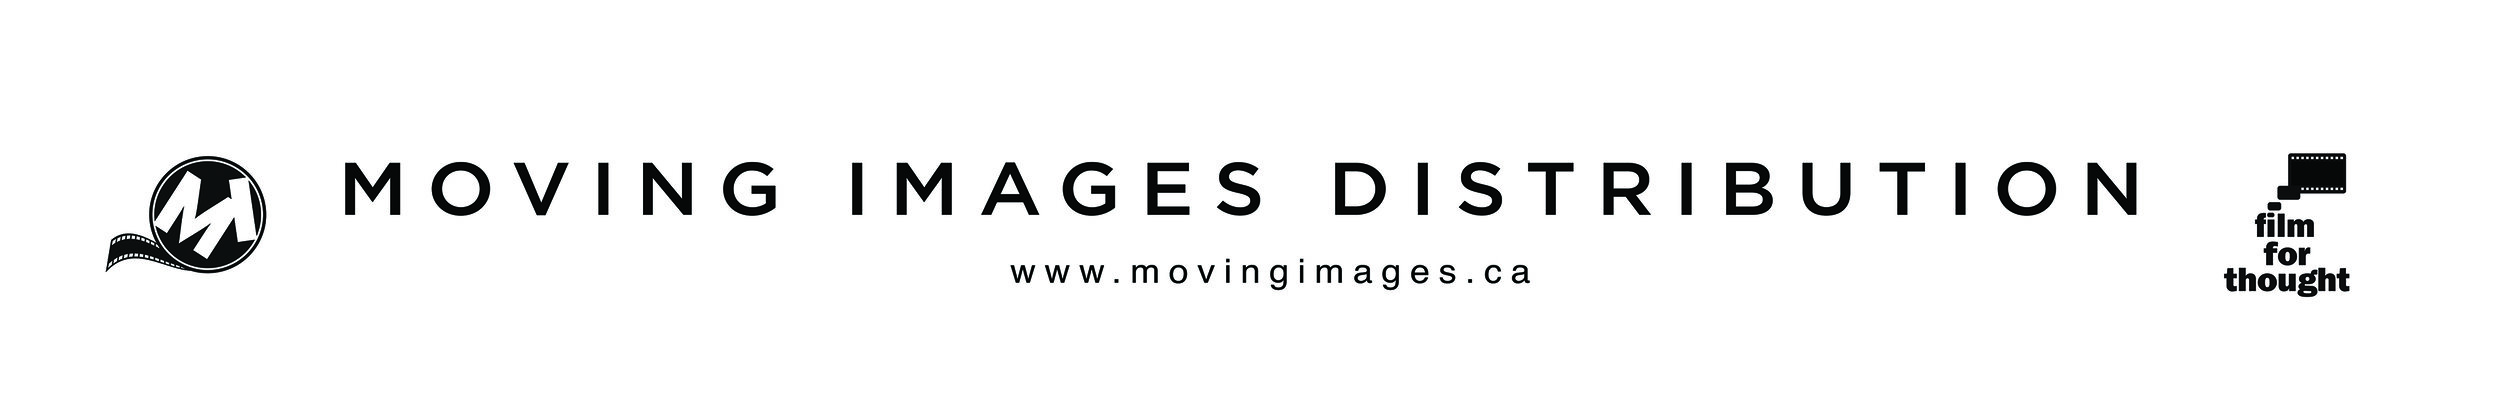 MID_logo_long_blackonwhite (1).jpg